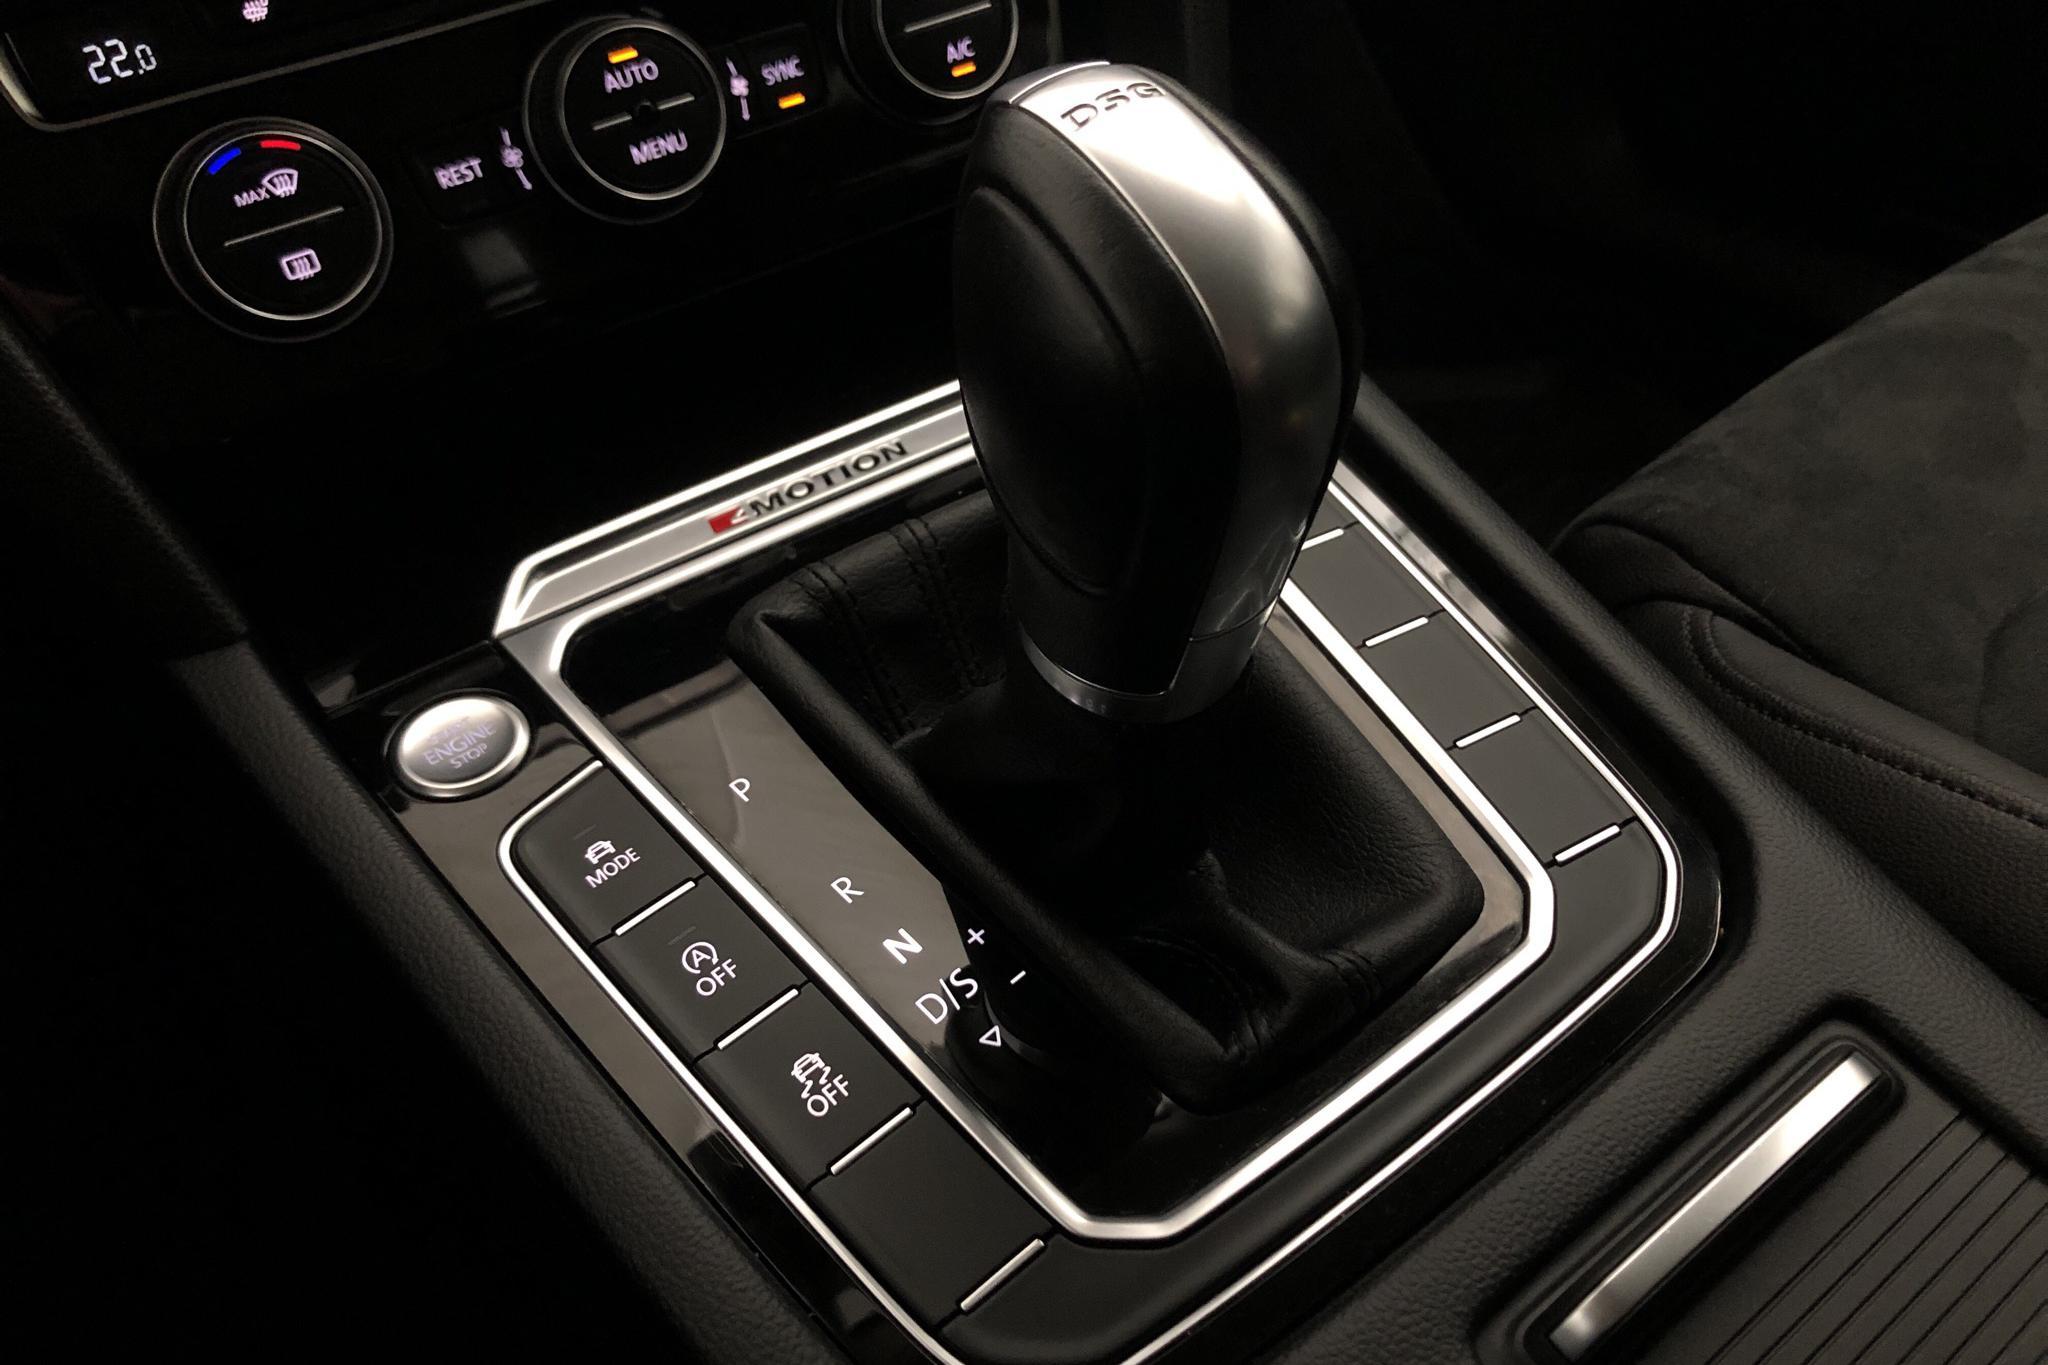 VW Passat 2.0 TDI Sportscombi 4MOTION (190hk) - 8 413 mil - Automat - svart - 2018